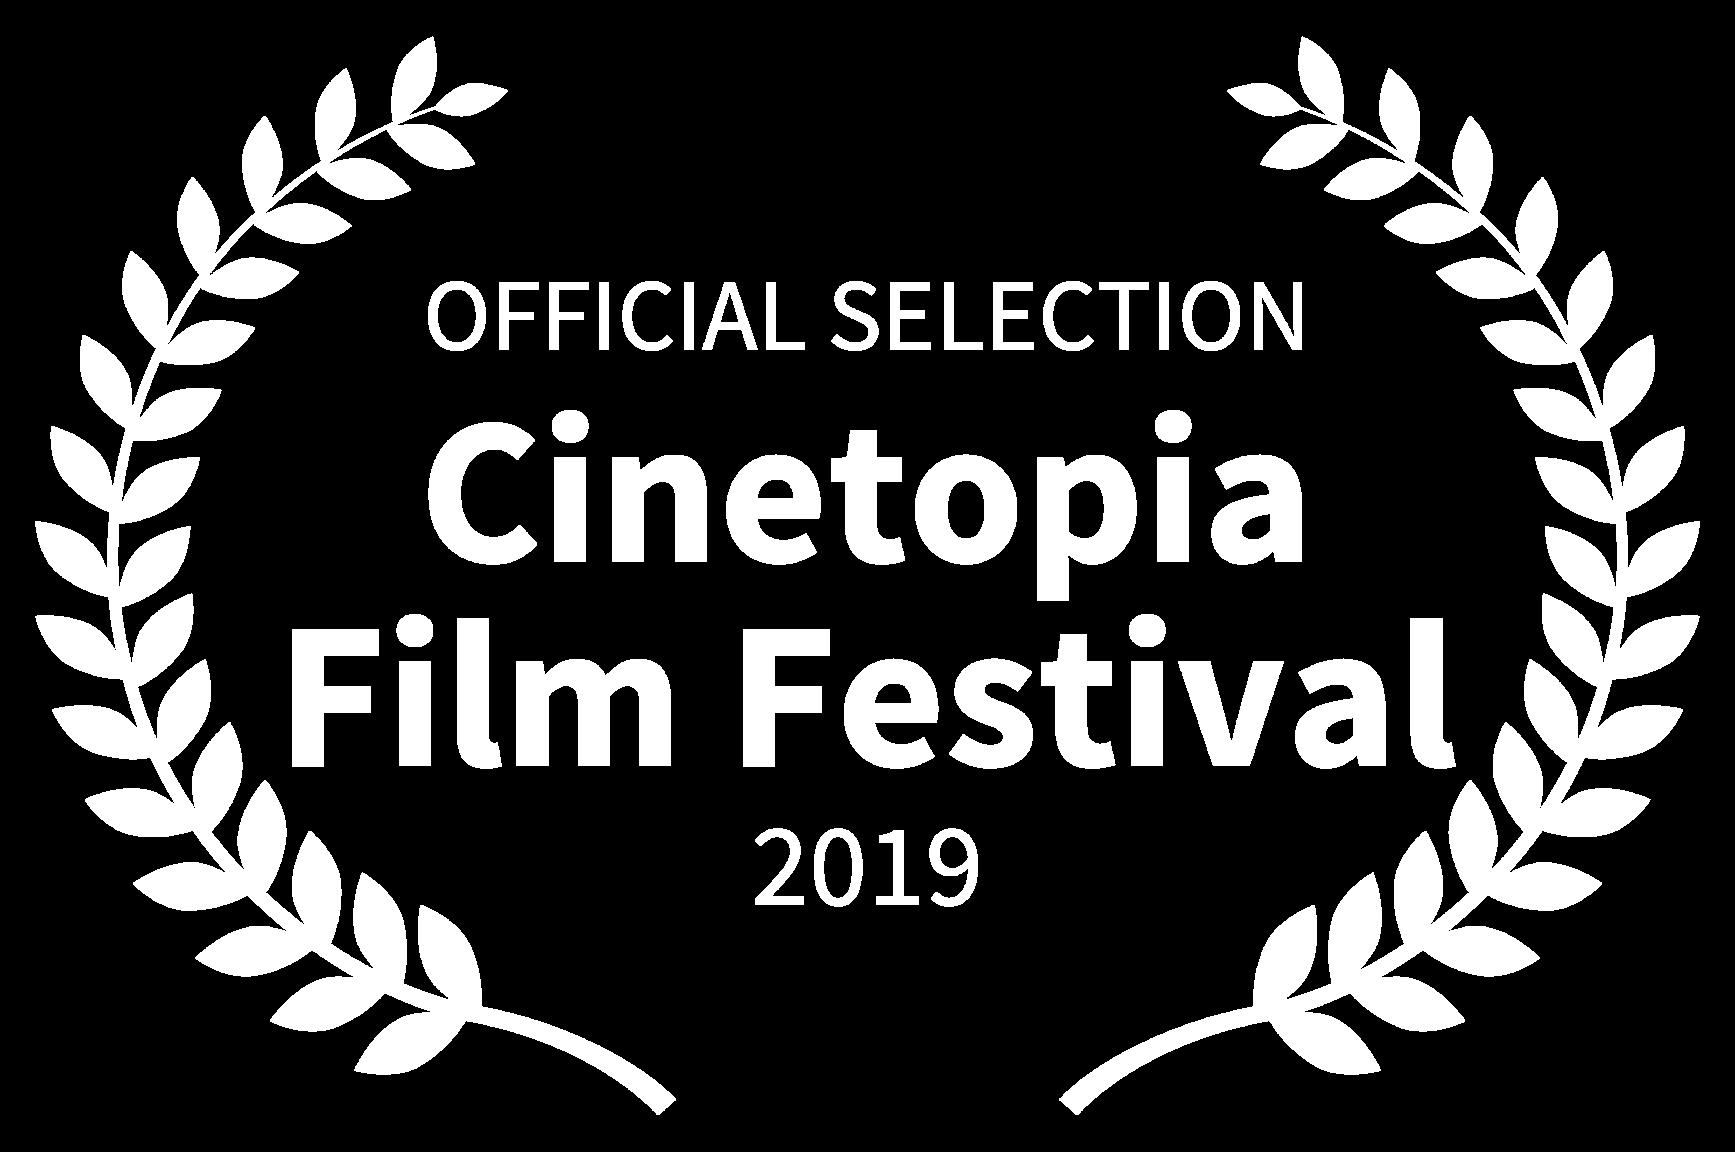 Cinetopia Film Festival (Michigan) - Sat, May 11* — 1:15PM @Ann Arbor, MIThu, May 16* —7PM @DetroitFri, May 17—4:15PM @Detroit, MISat, May 18—5PM @ Ann Arbor, MI*Subject Mason Caminiti at 5/11 screening*Subject Dominic Chilko at 5/16 screening